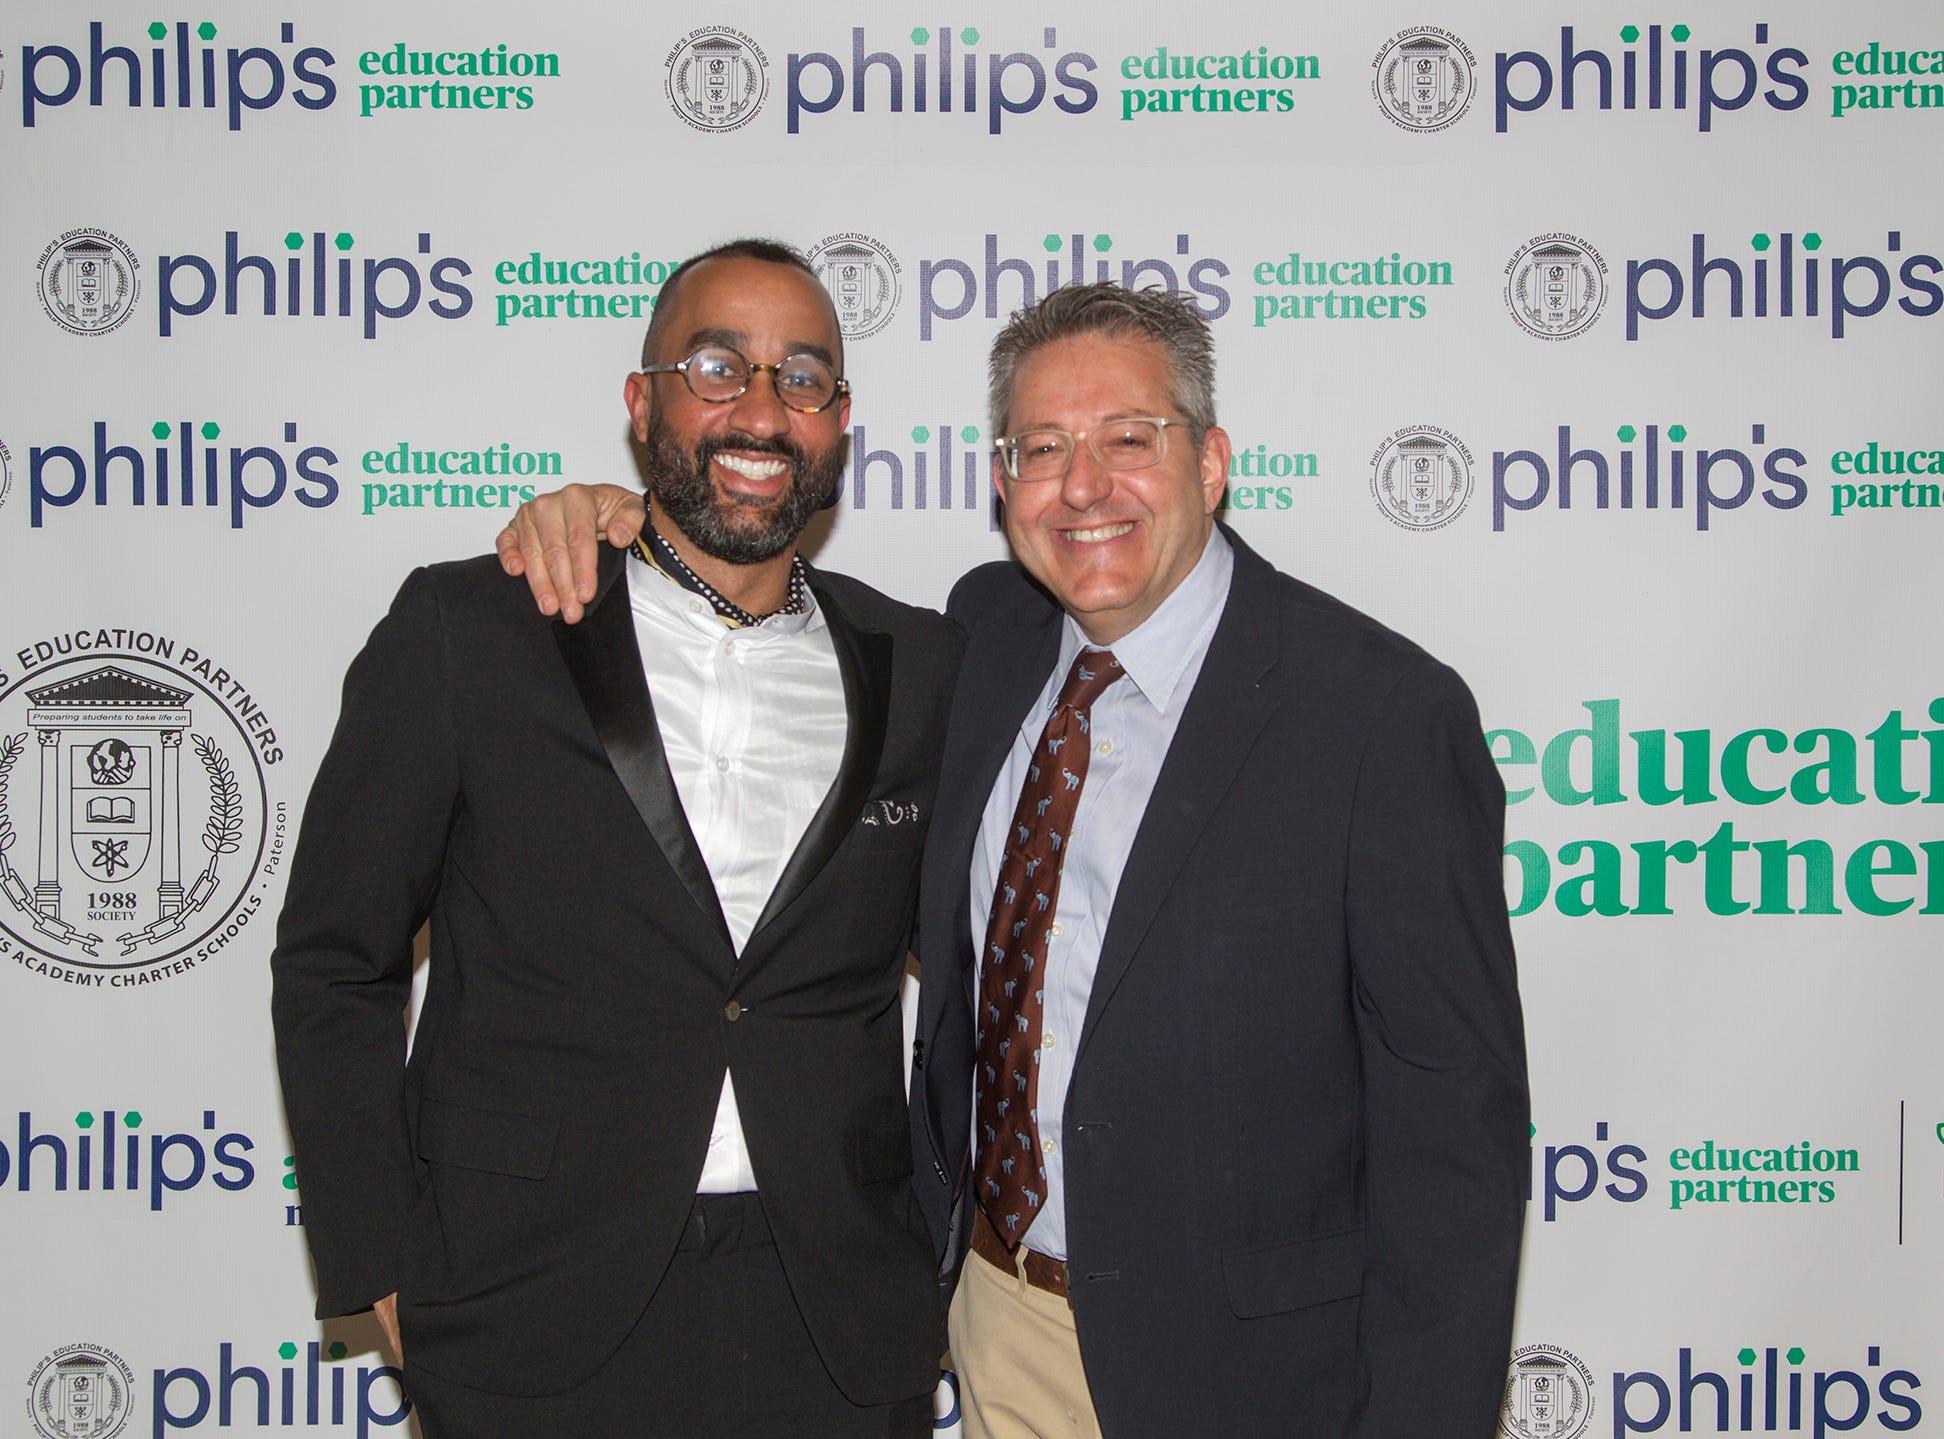 Jayson Council, Ray Graj. Philip's Education Partners host The Dream Maker 30th anniversary gala at The Mezzanine in Newark 3/29/2019.